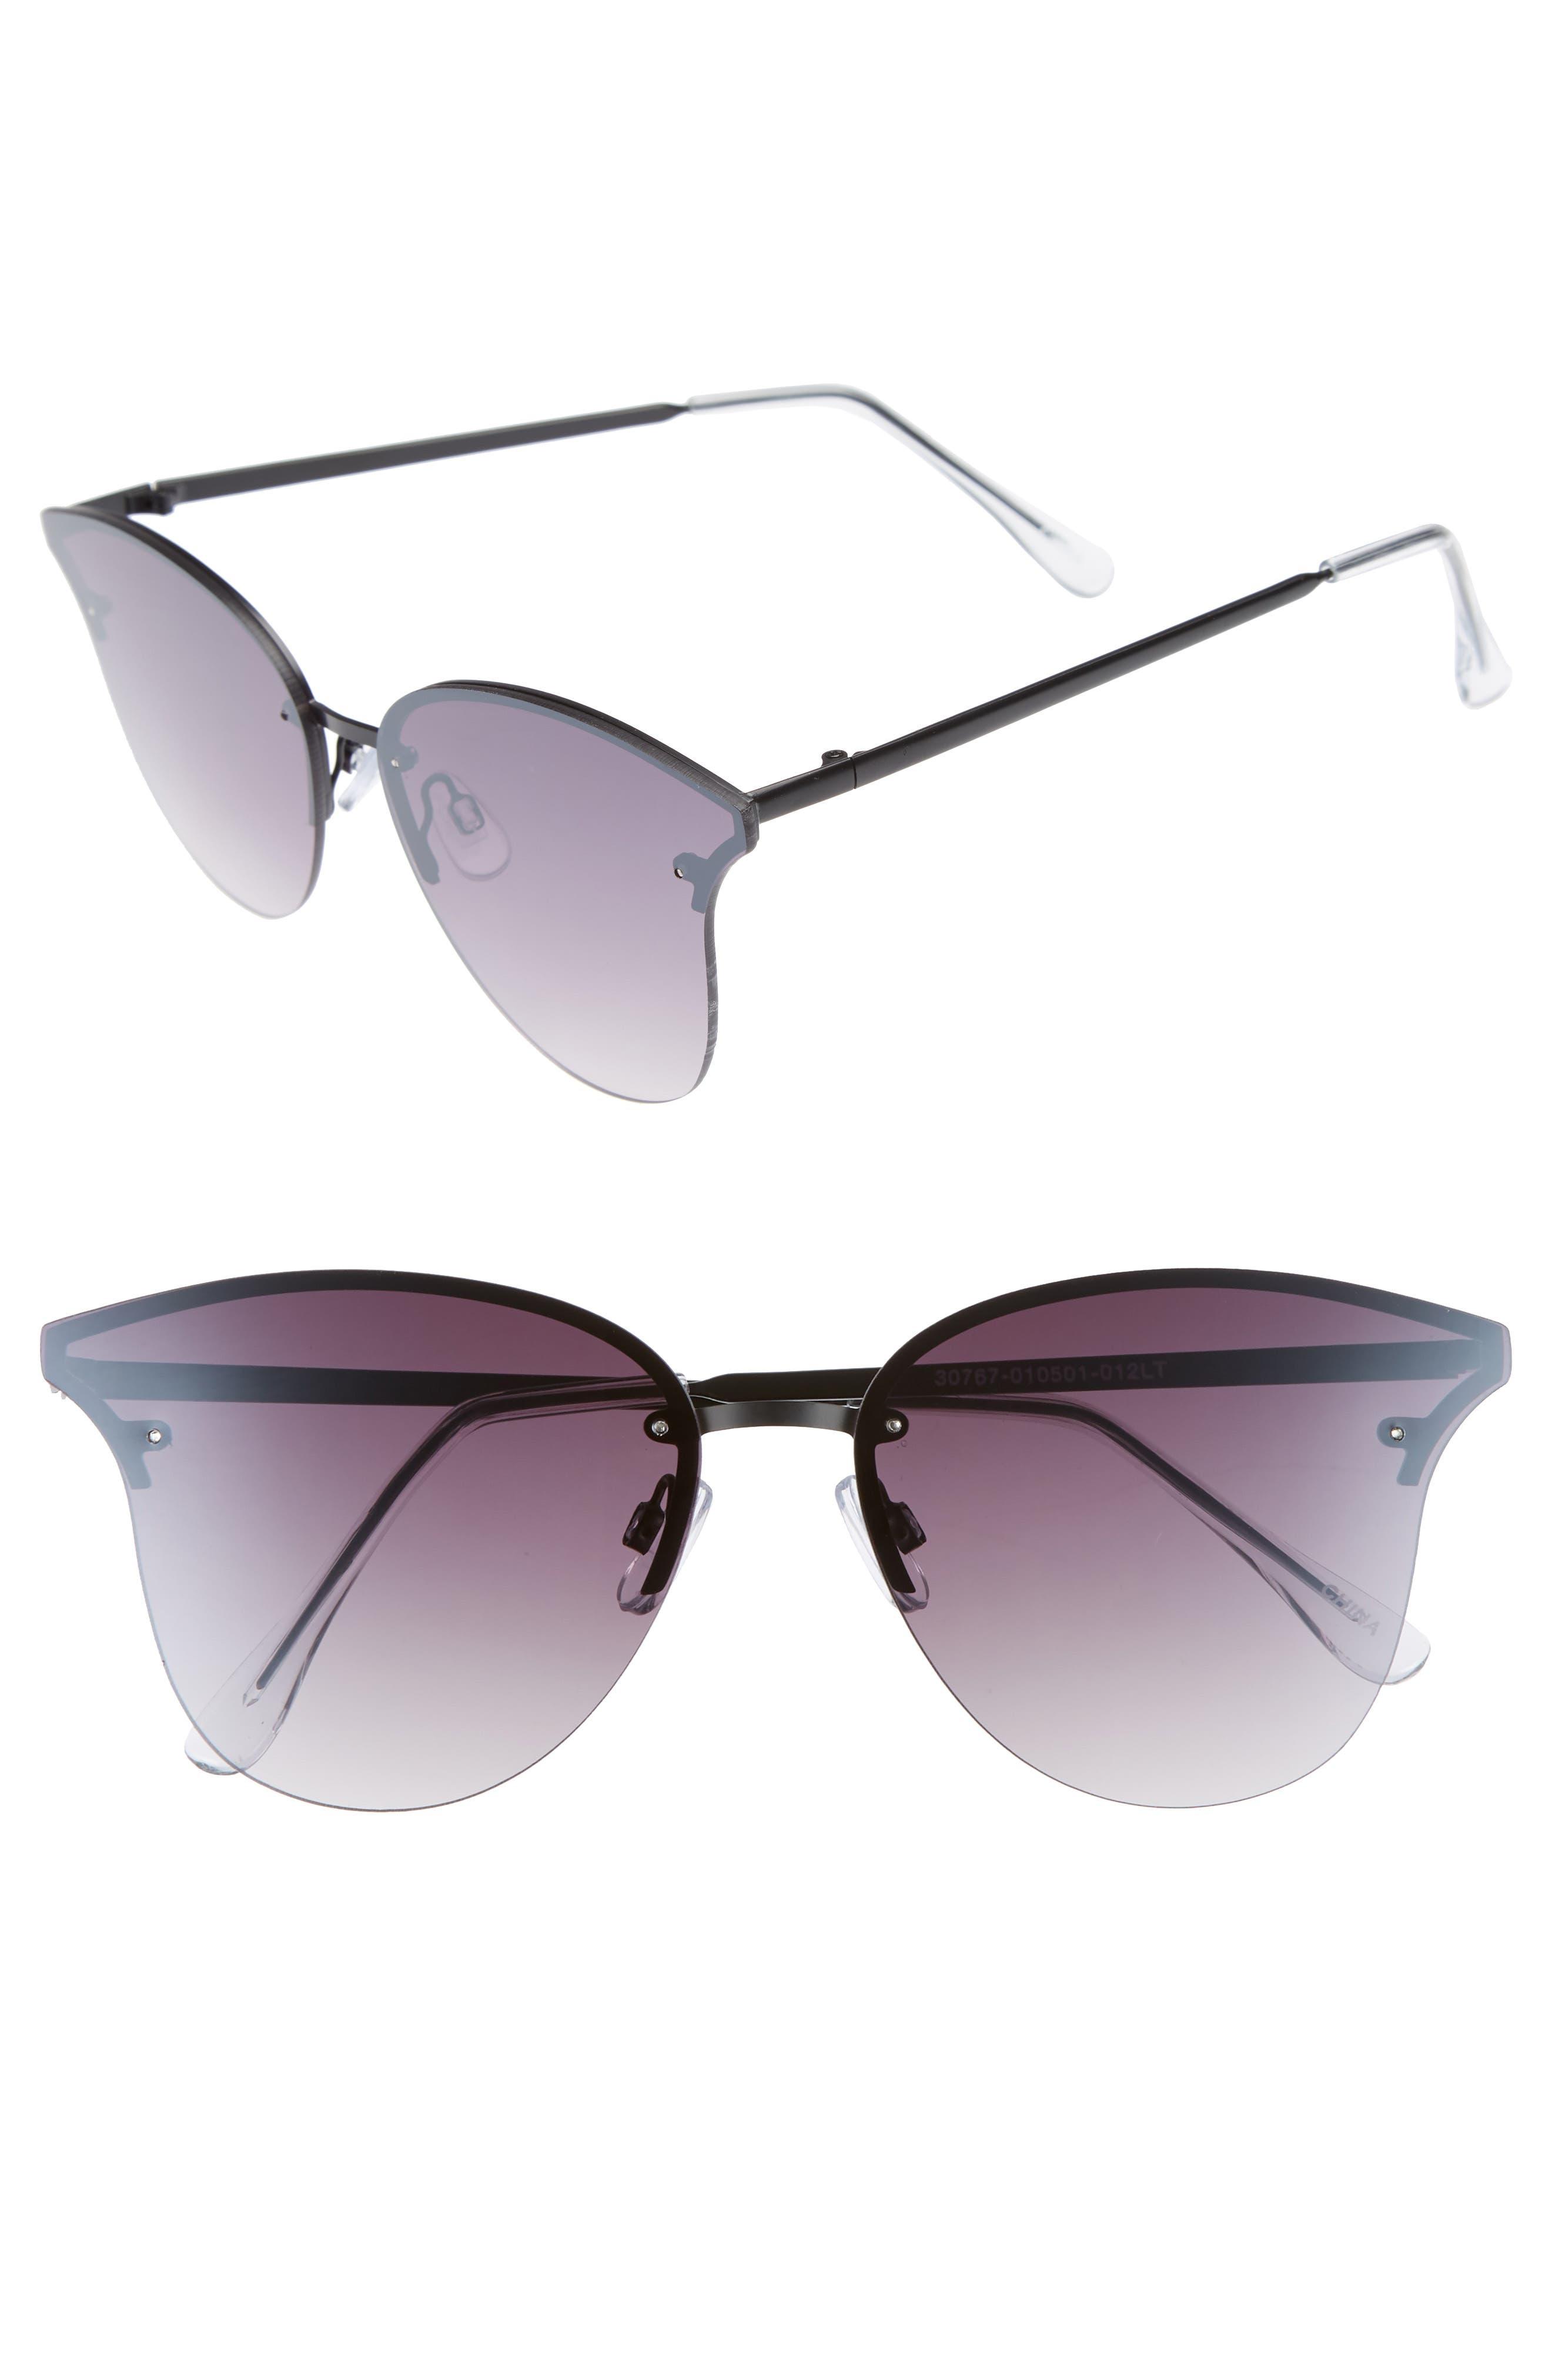 61mm Rimless Cat Eye Sunglasses,                             Main thumbnail 1, color,                             001